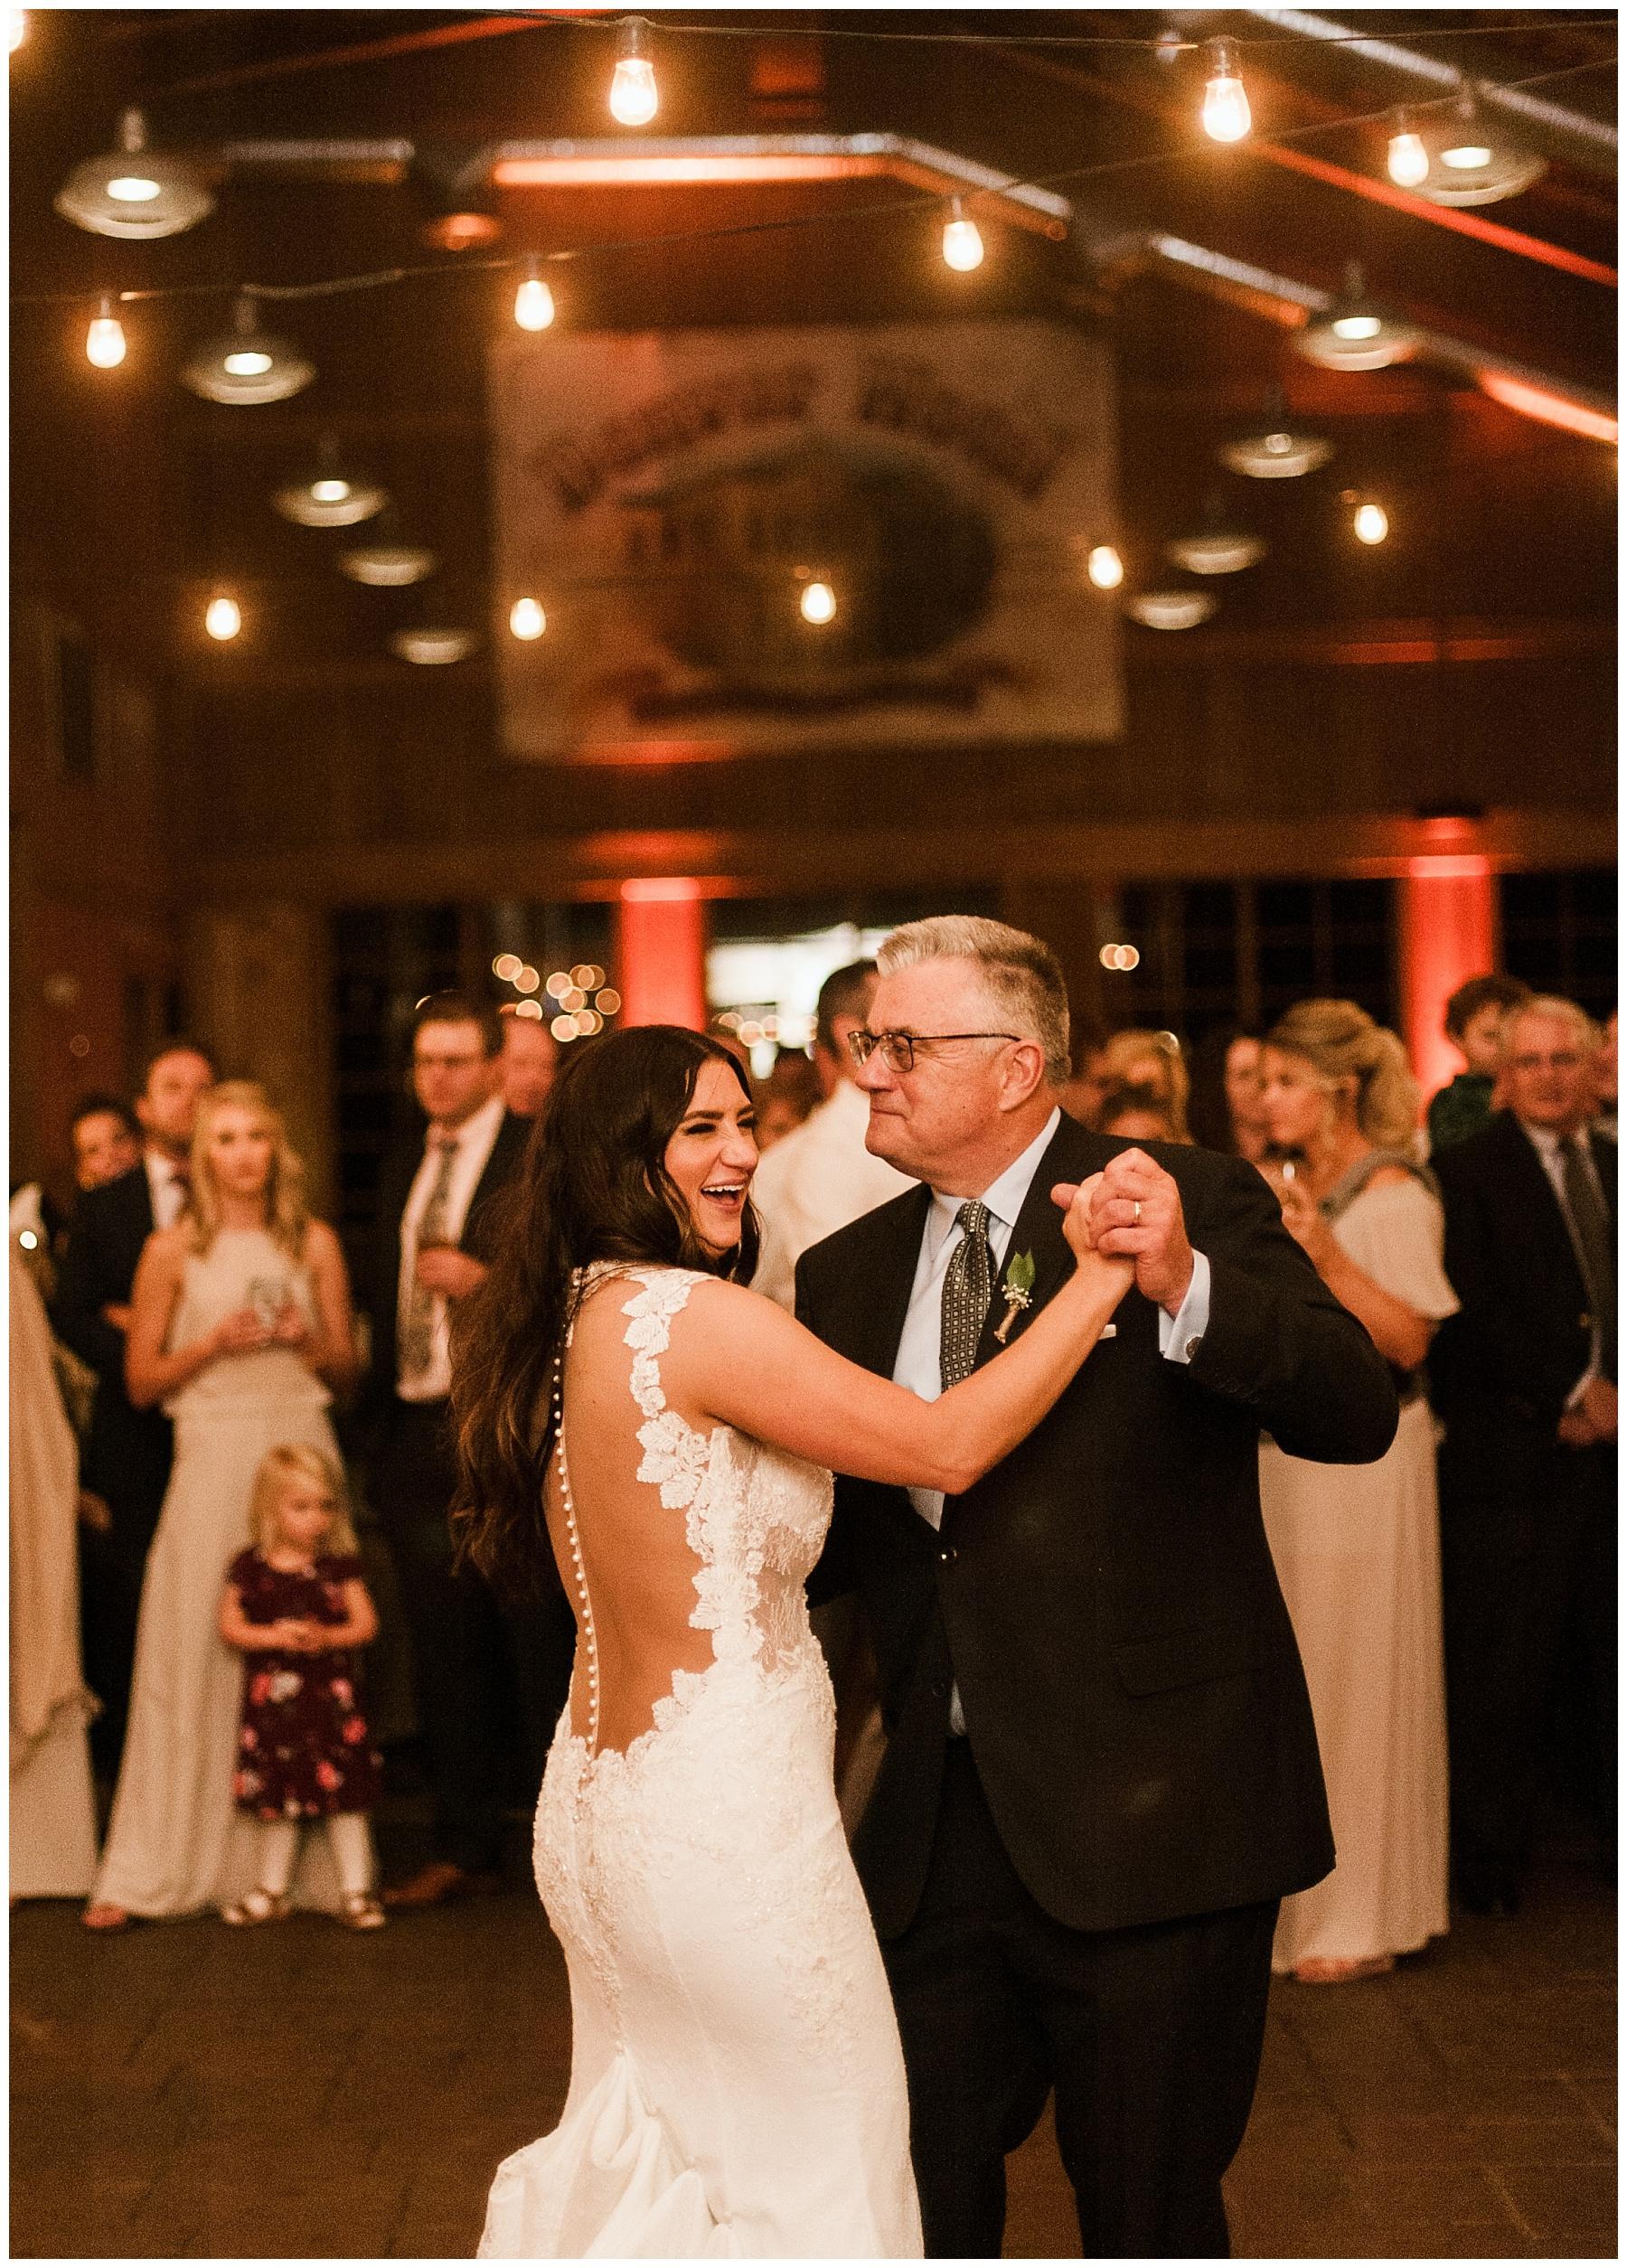 Katesalleyphotography-656_married in Breckenridge.jpg